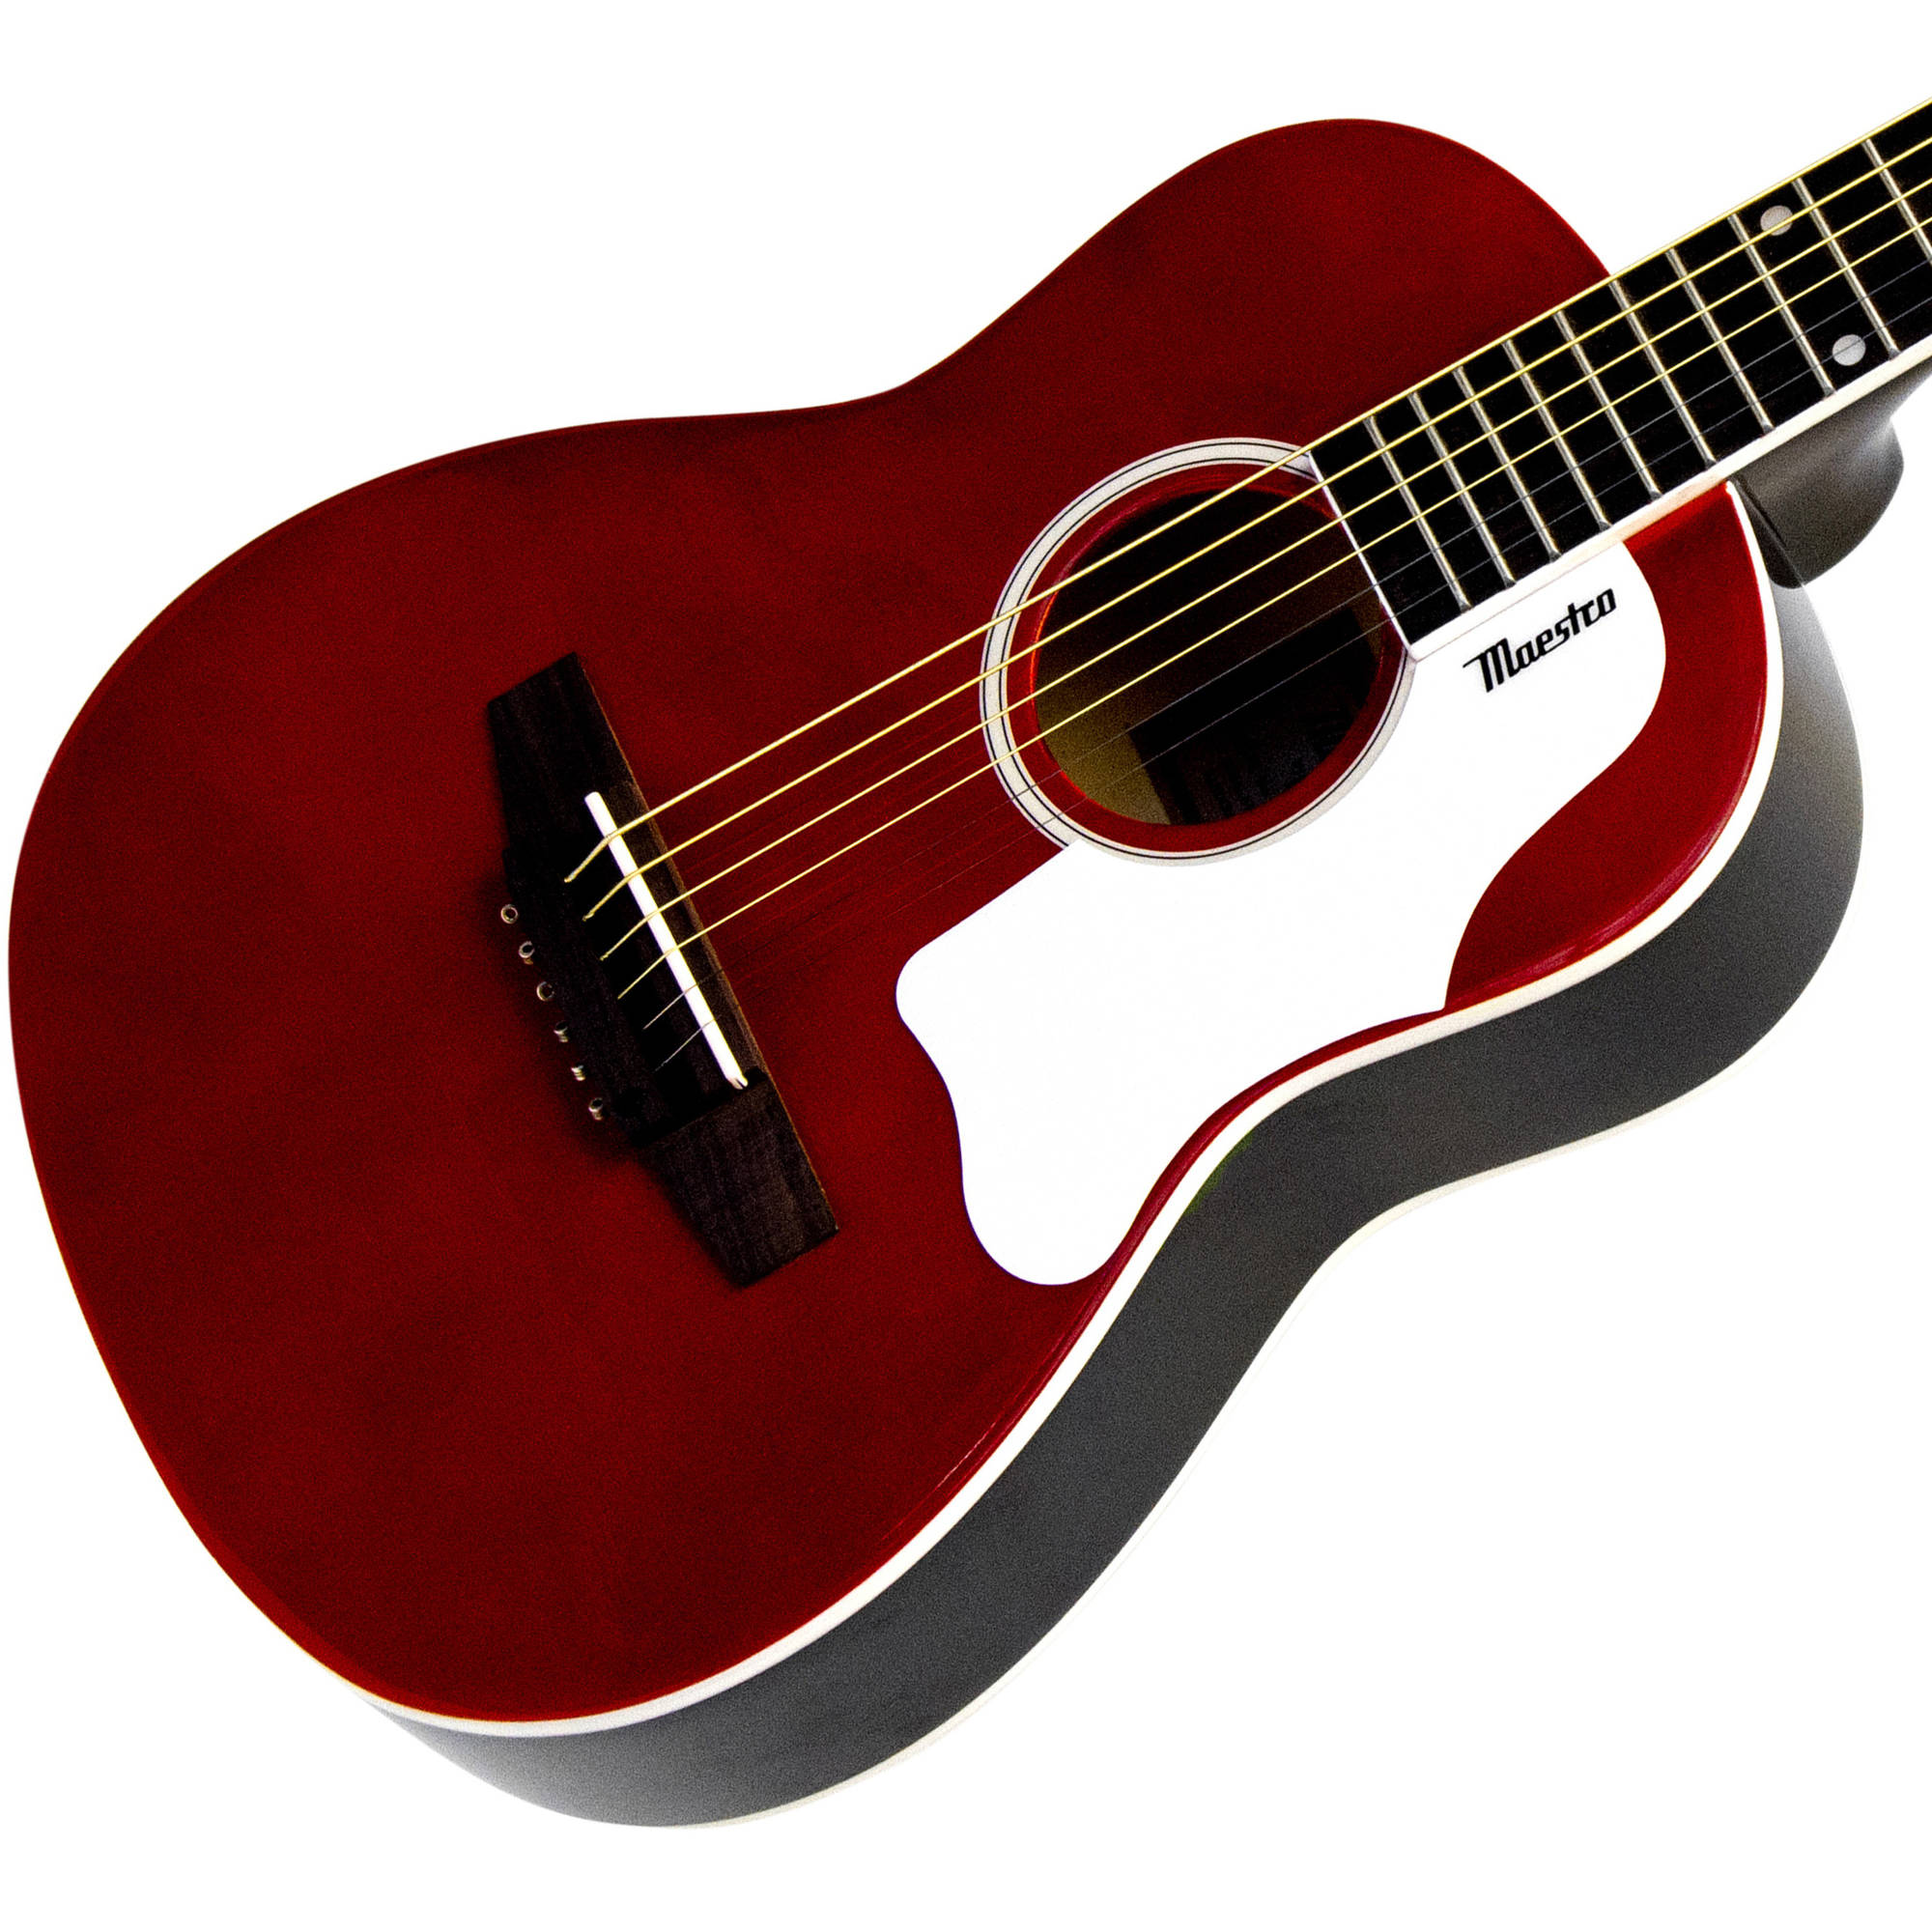 kids acoustic guitar with case for beginner boys girls steel strings age 4 5 6 633270848166 ebay. Black Bedroom Furniture Sets. Home Design Ideas